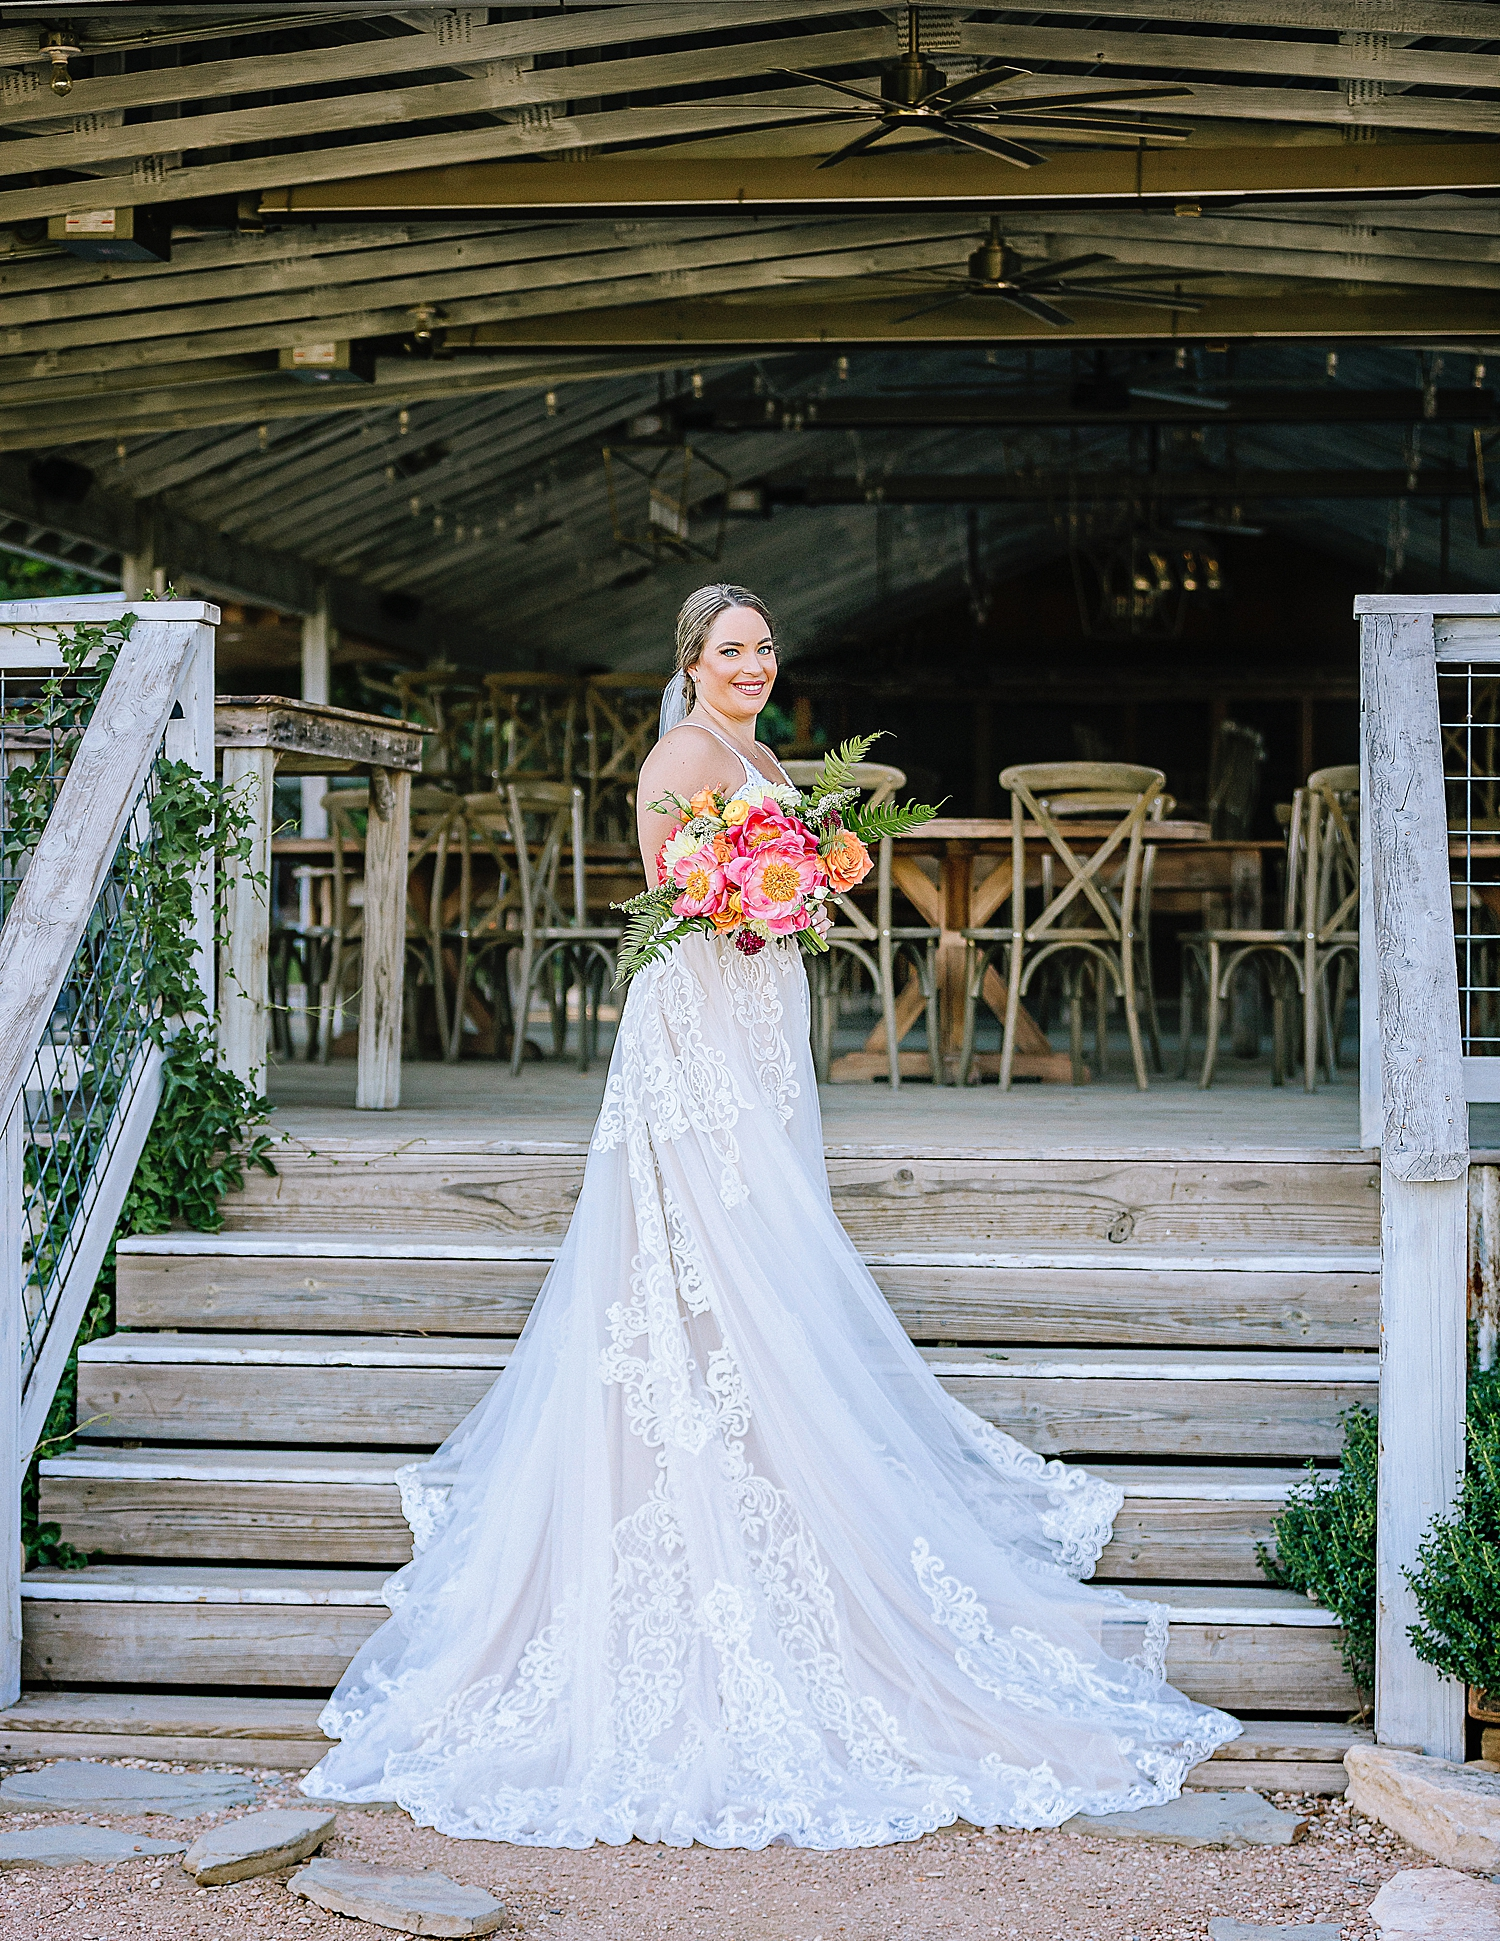 Gruene-Estate-Wedding-New-Braunfels-Bride-Bridal-Photos-Carly-Barton-Photography_0008.jpg